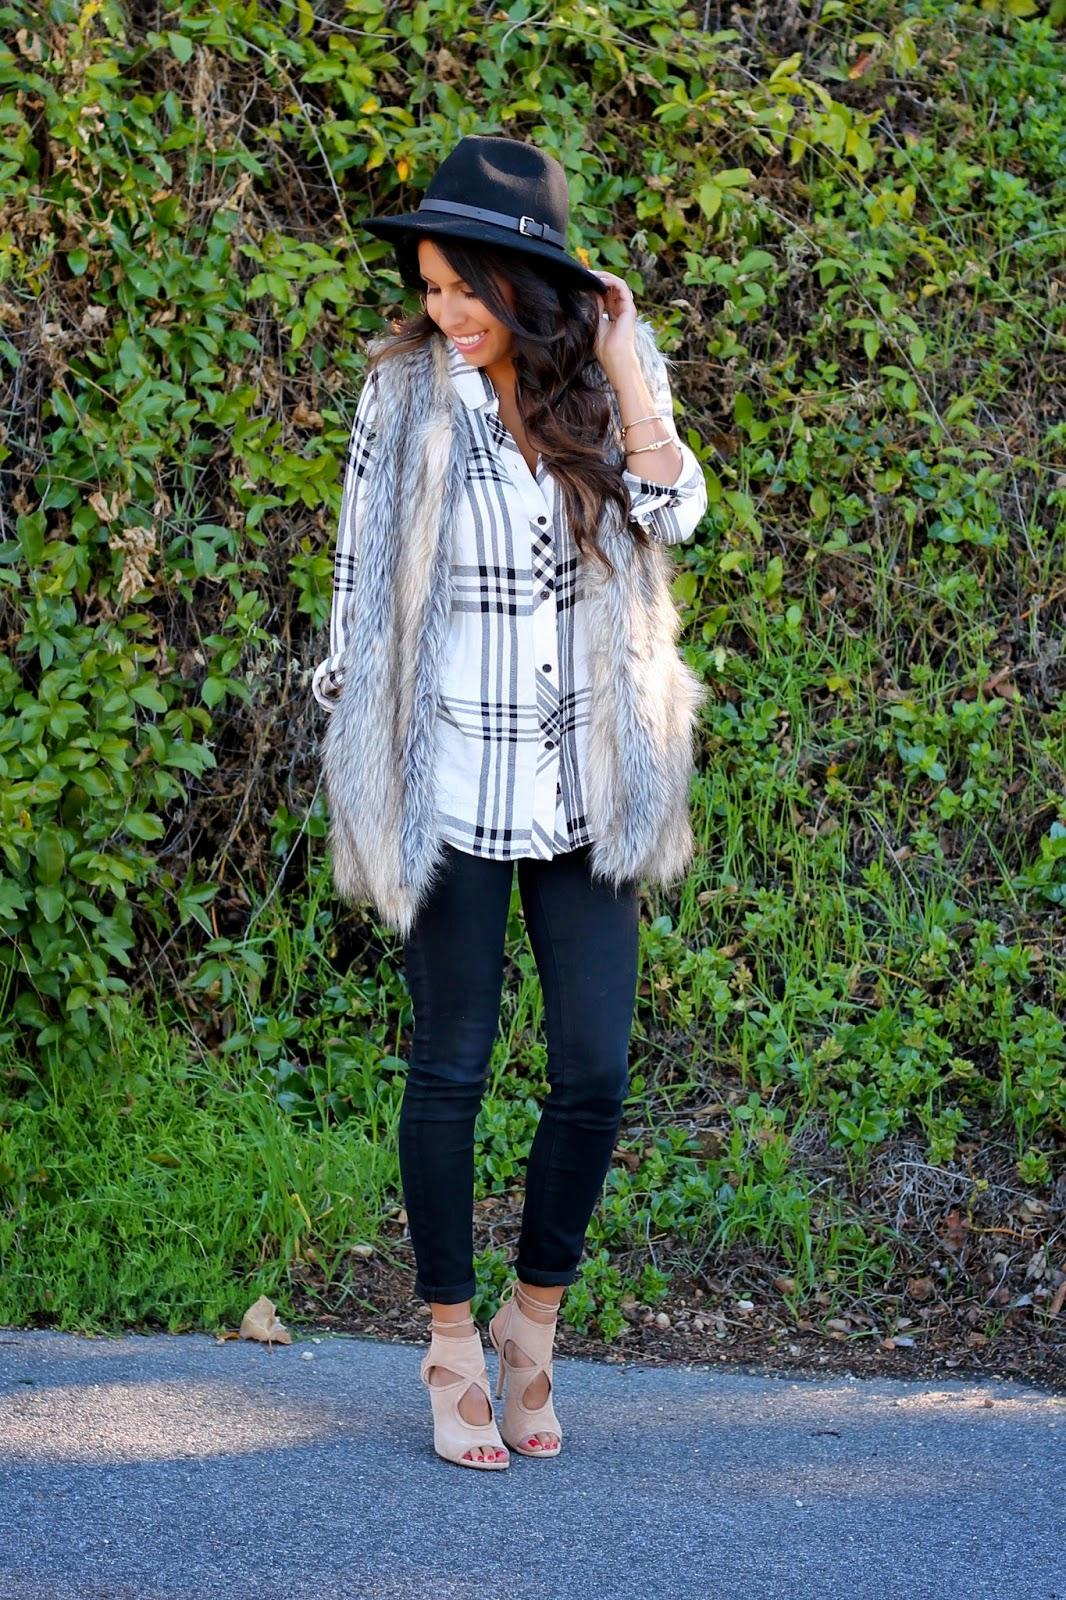 how to style fur vest, target style, fashion, pursuit of shoes, rails shirt